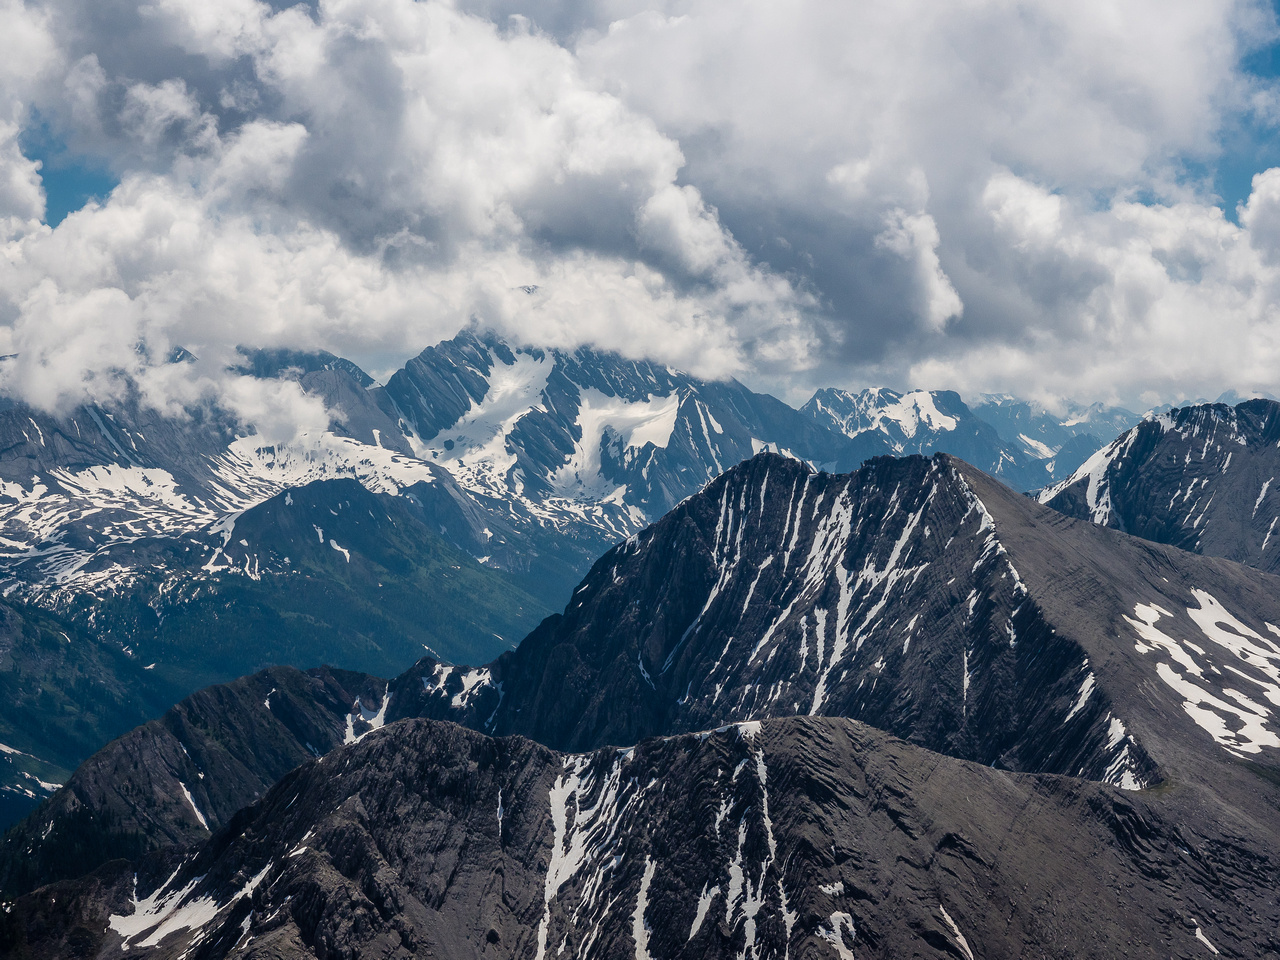 Mount Sir Douglas is buried in clouds beyond Mount Warre.